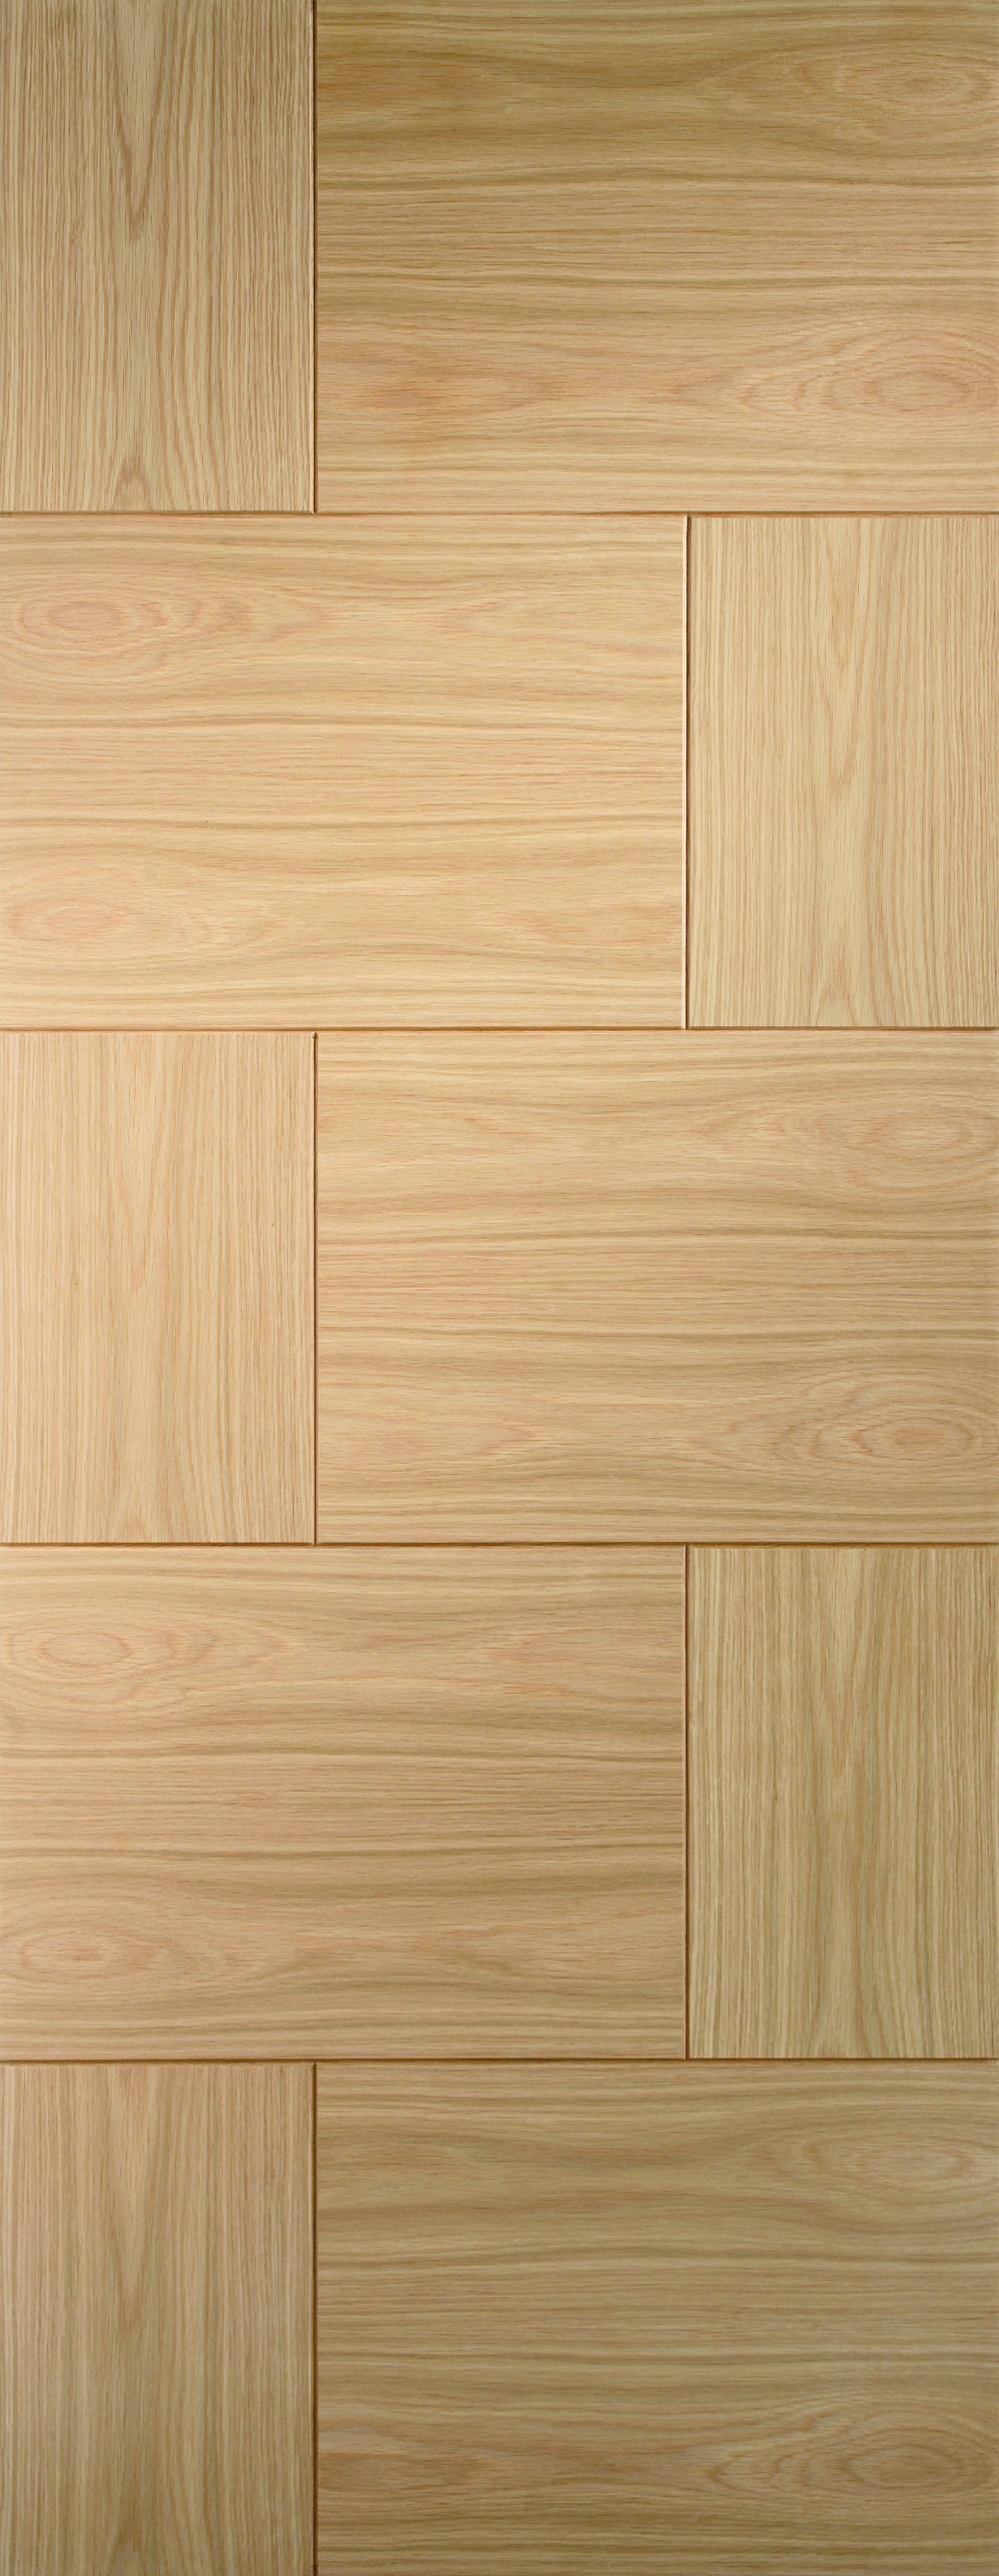 Ravenna Oak Door - PREFINISHED